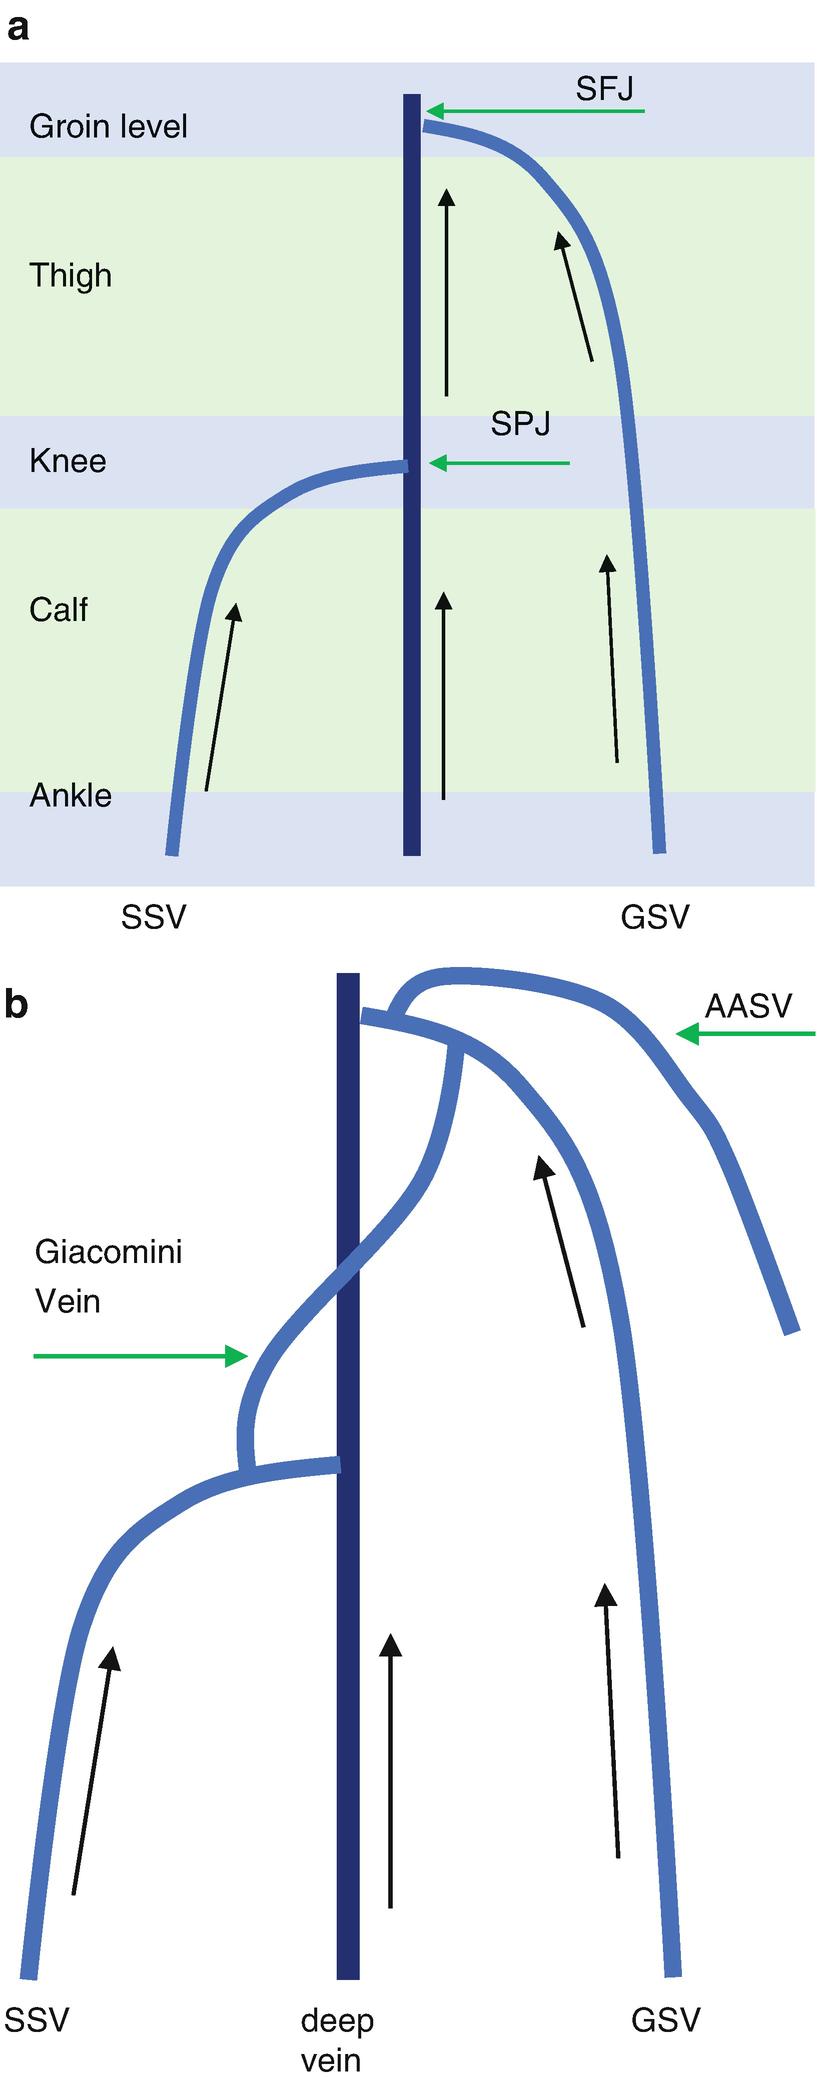 Attractive Vein Of Giacomini Anatomy Ornament - Anatomy Ideas ...